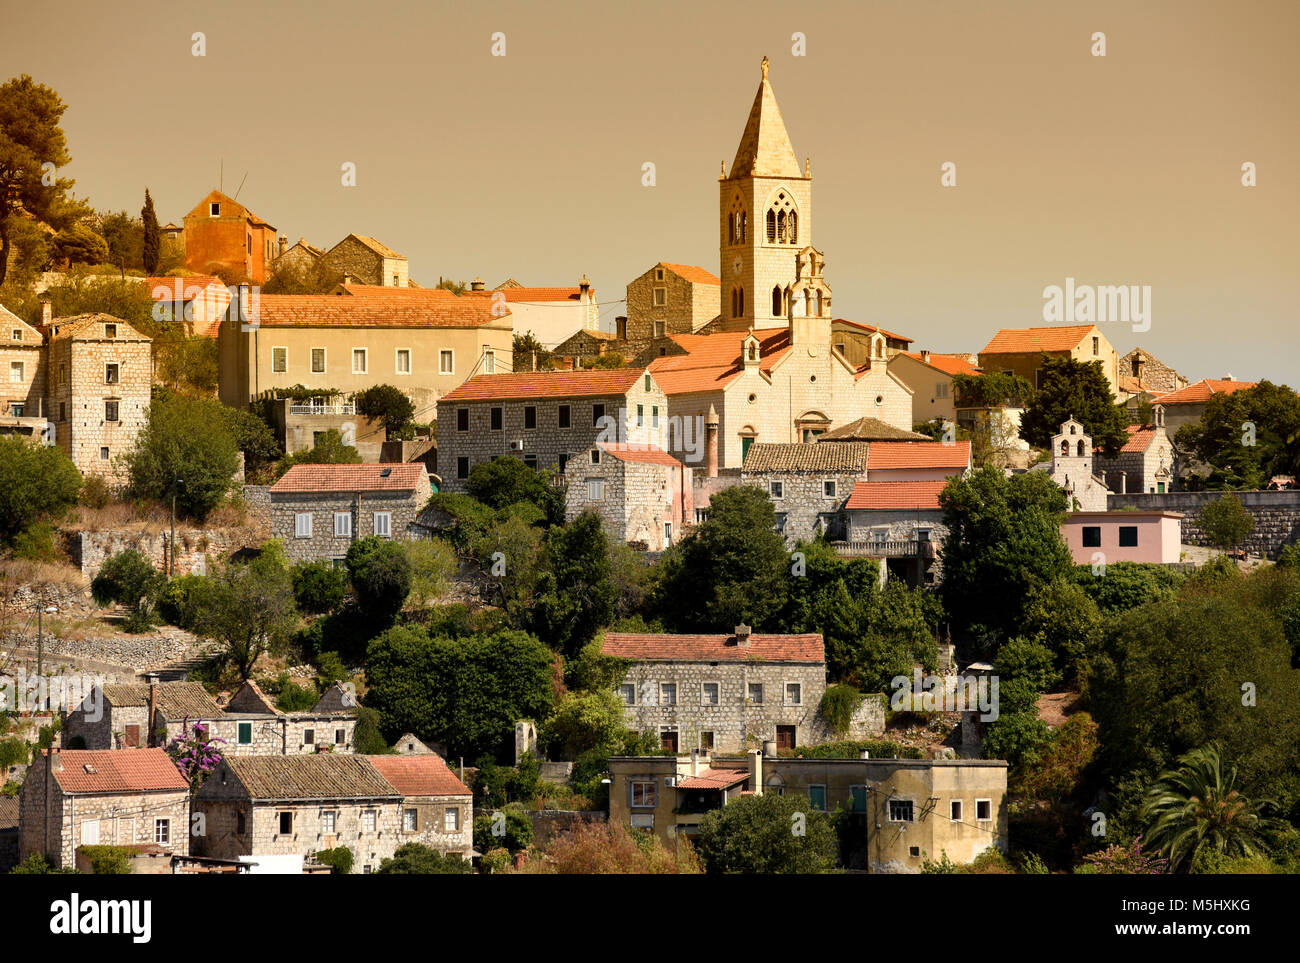 Lastovo old town, Lastovo island, Croatia Stock Photo